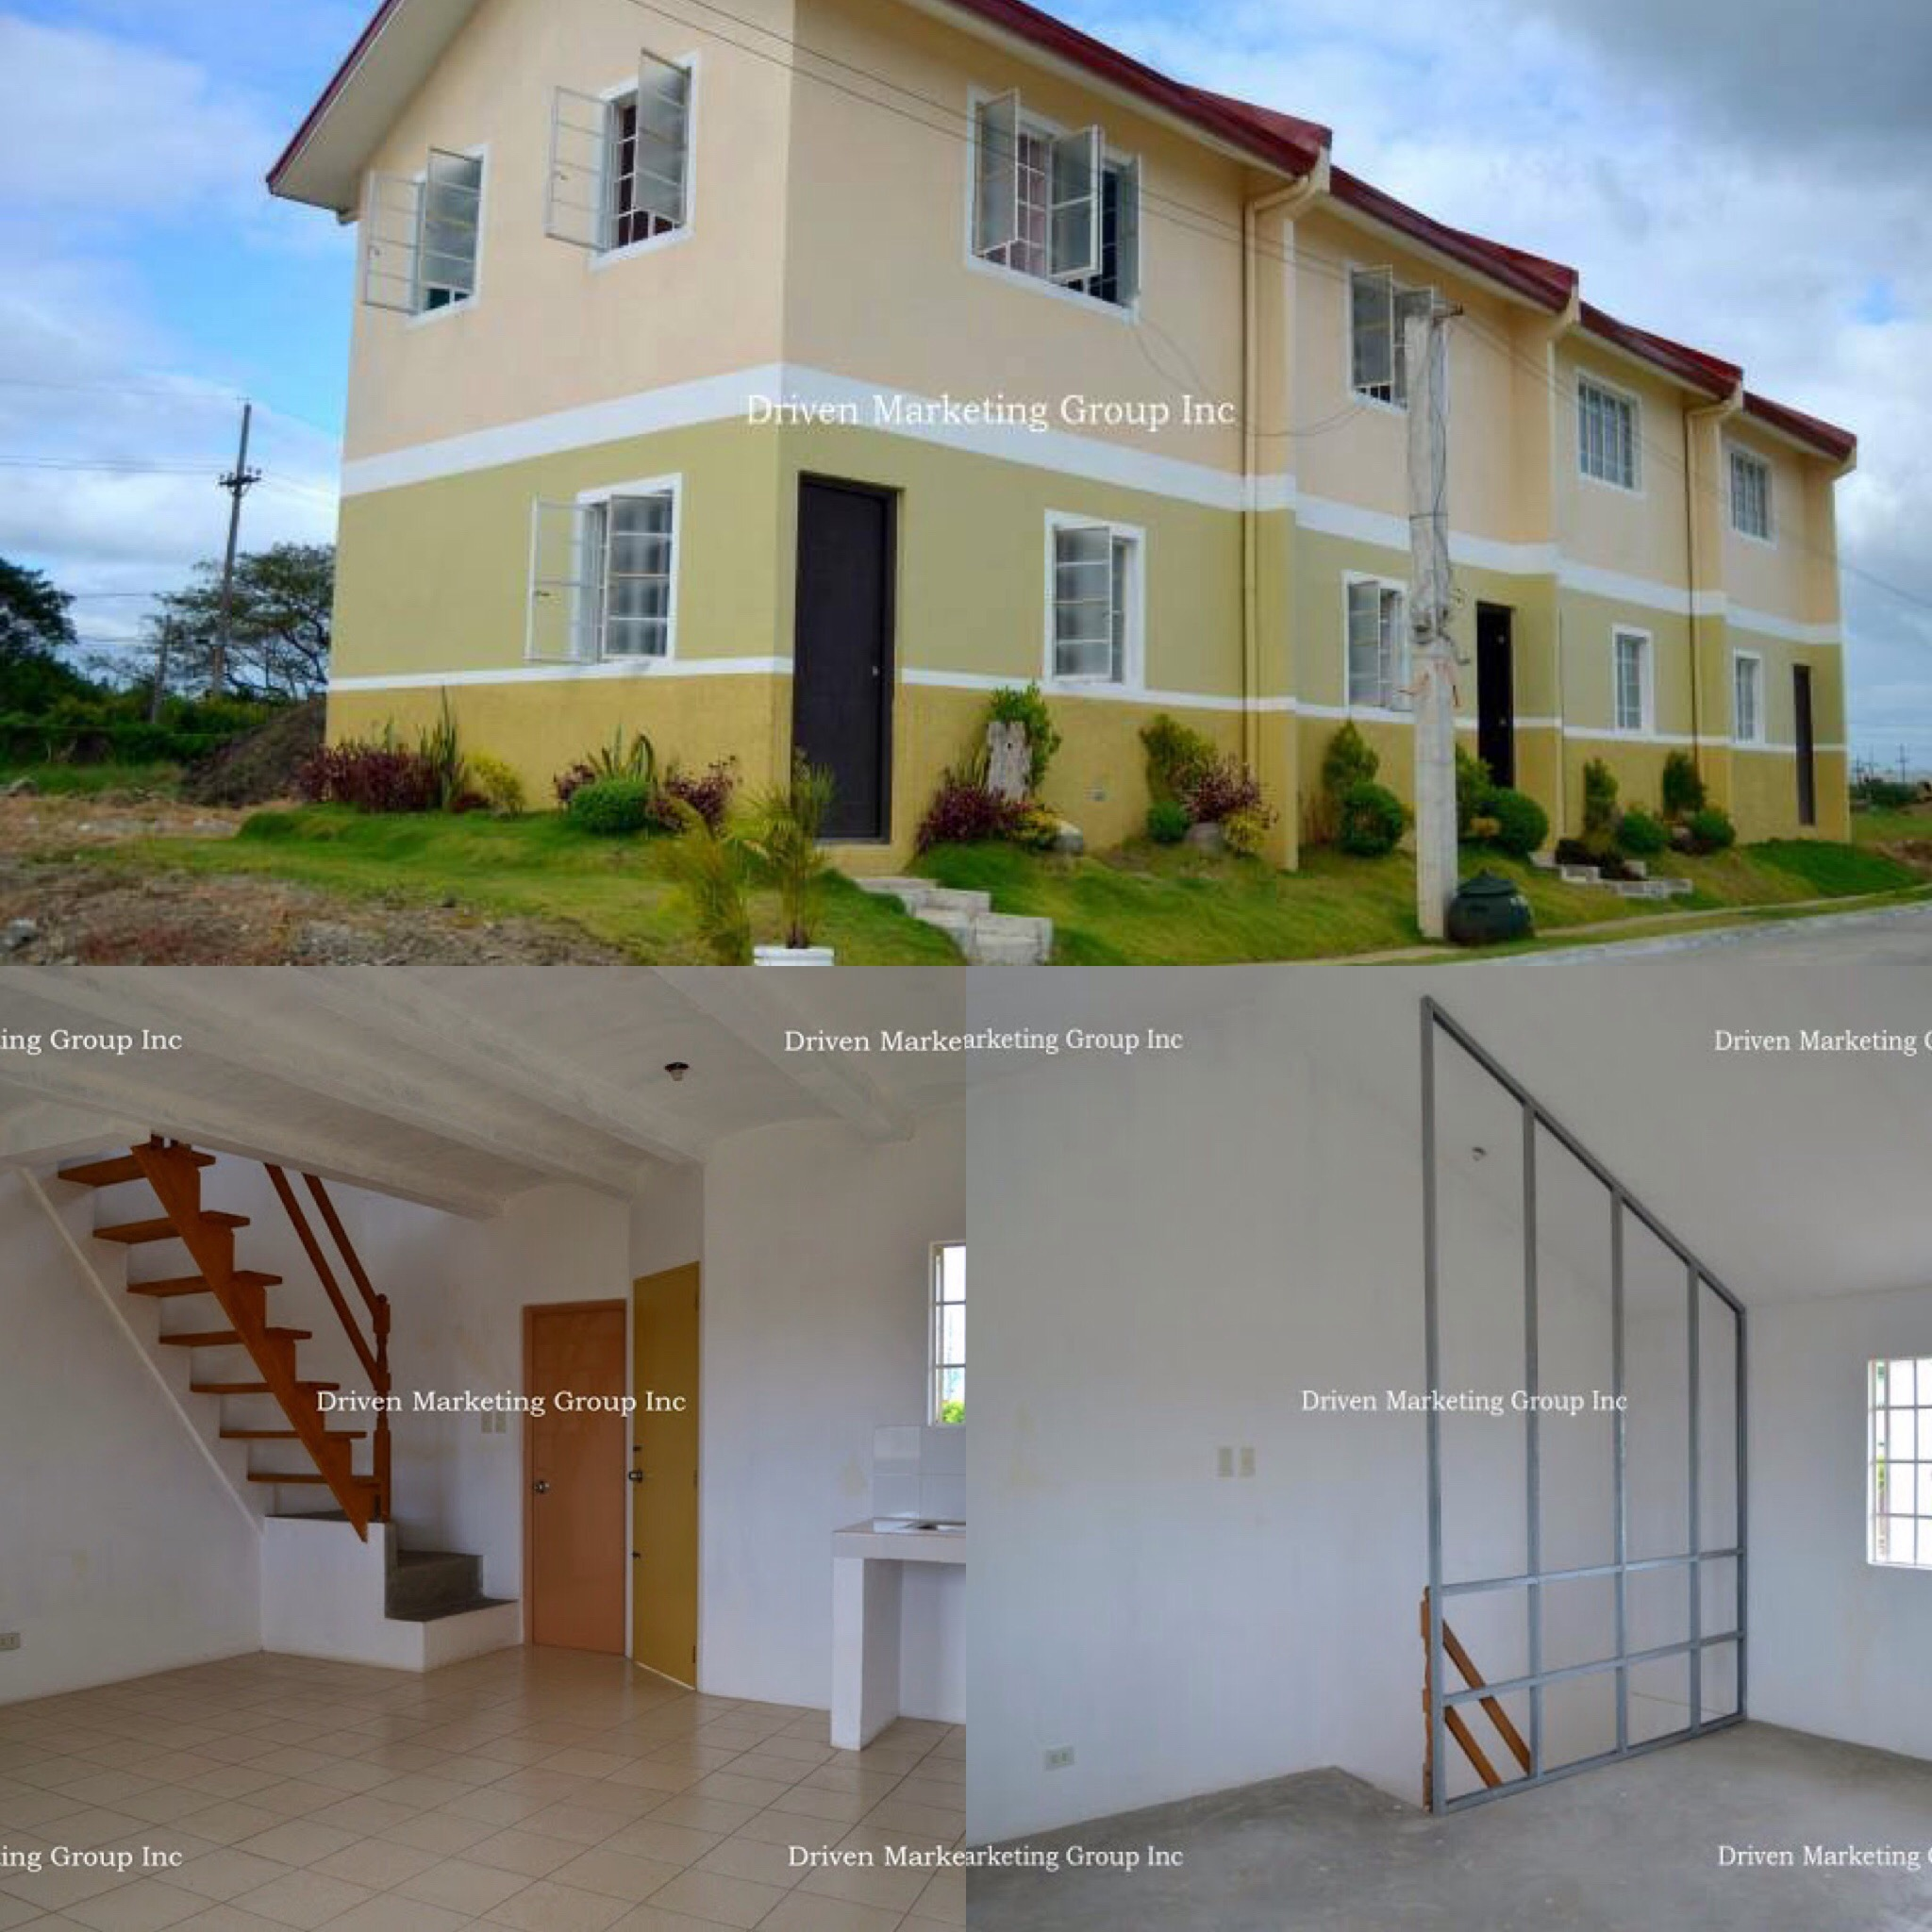 rent to own house berkeley laguna 09235564517 rico navarro